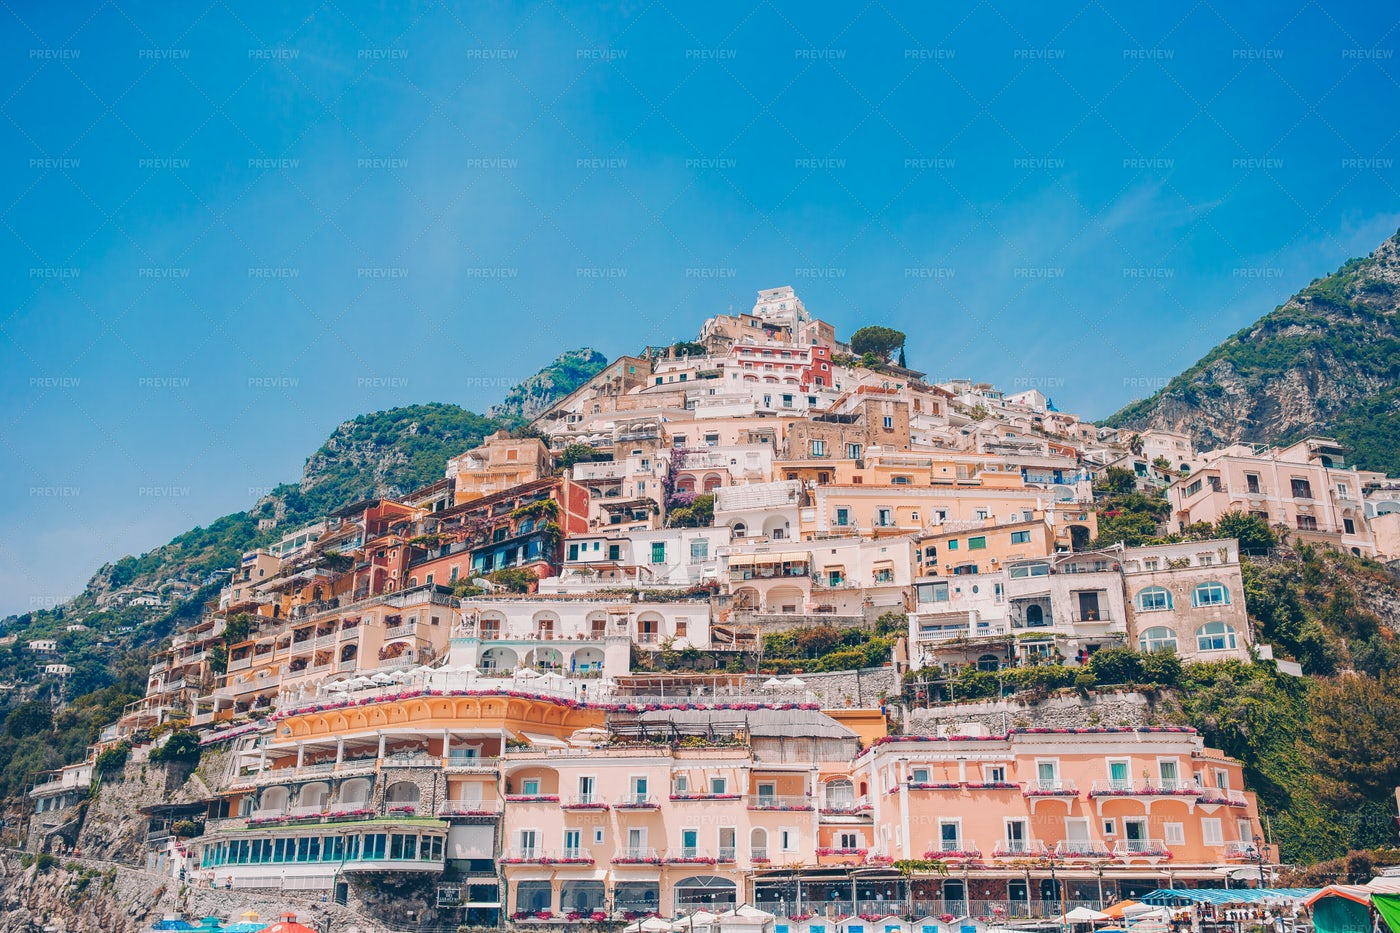 Italian Cliff Town: Stock Photos